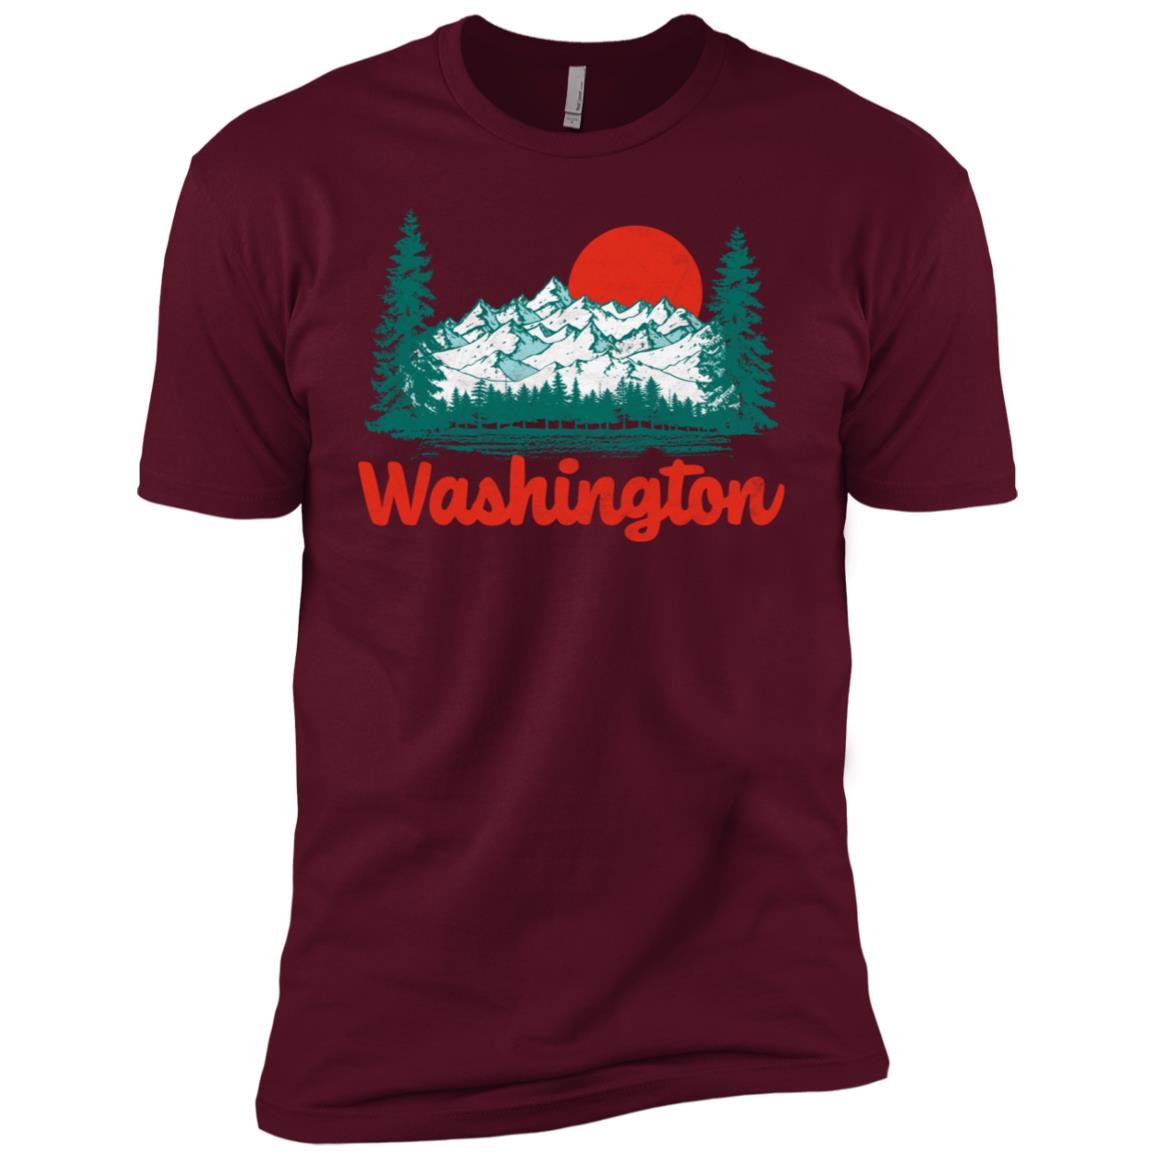 Retro Washington Vintage 80s State Pride Tee Men Short Sleeve T-Shirt